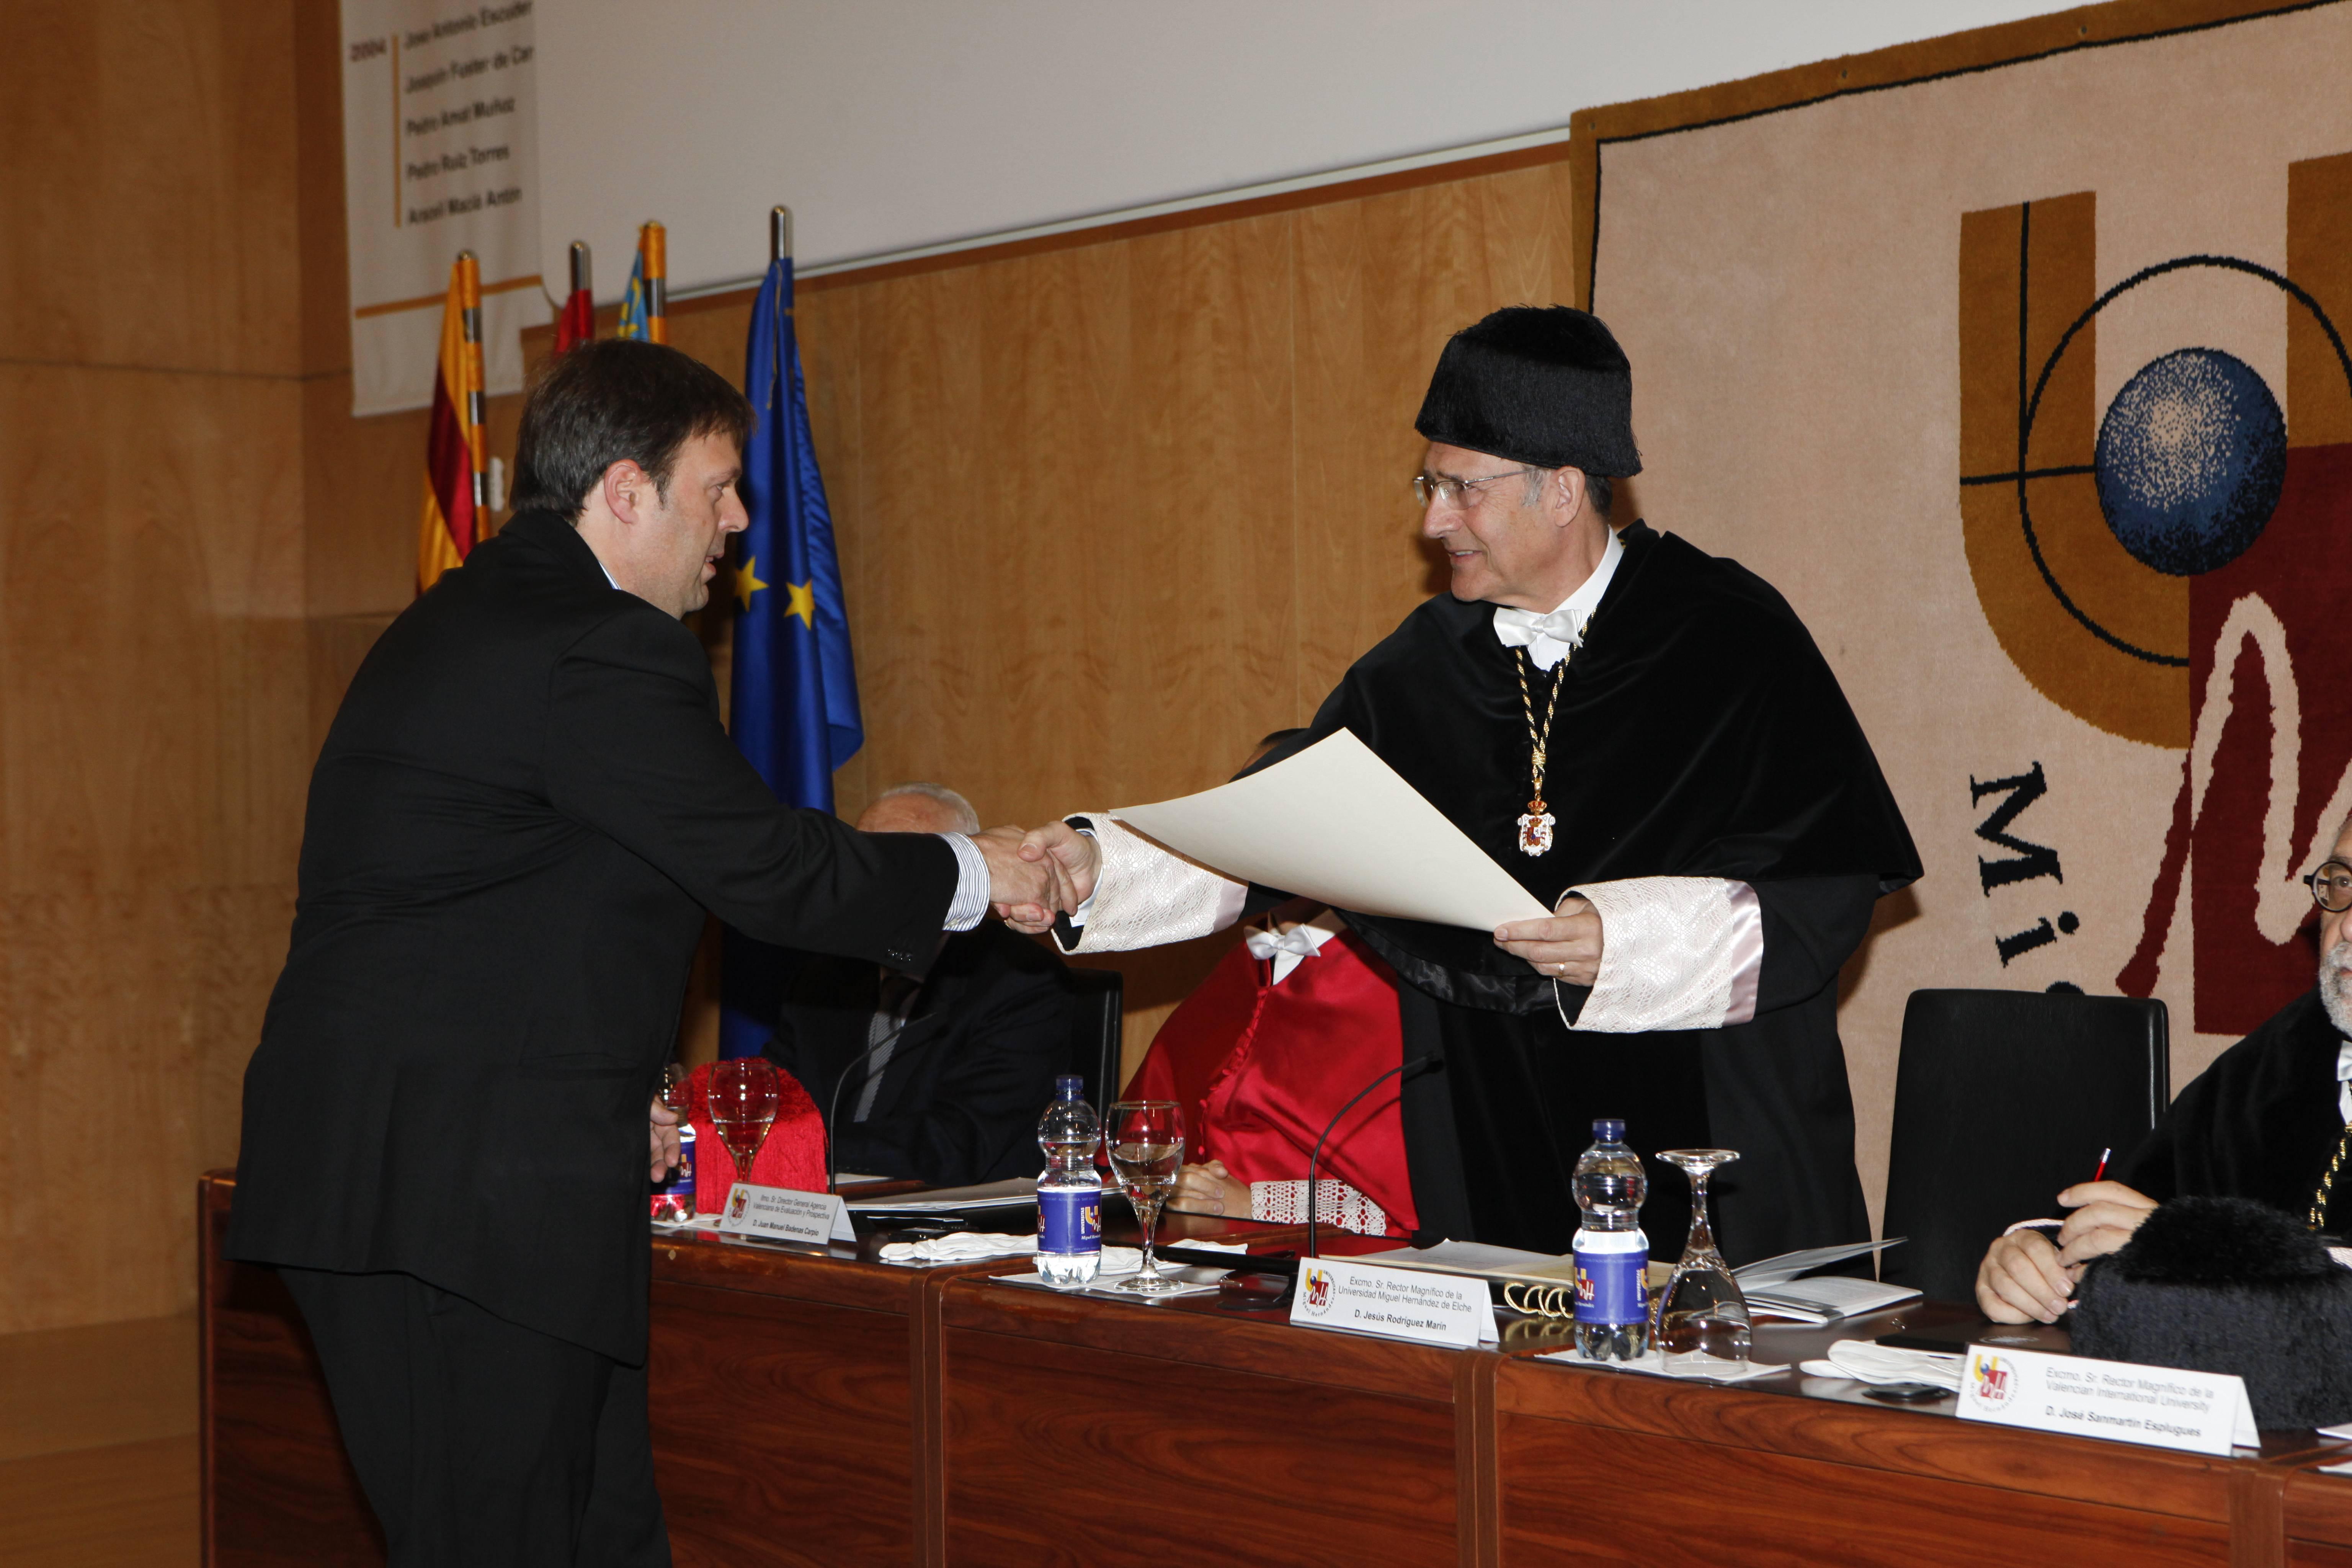 doctor-honoris-causa-luis-gamir_mg_1045.jpg